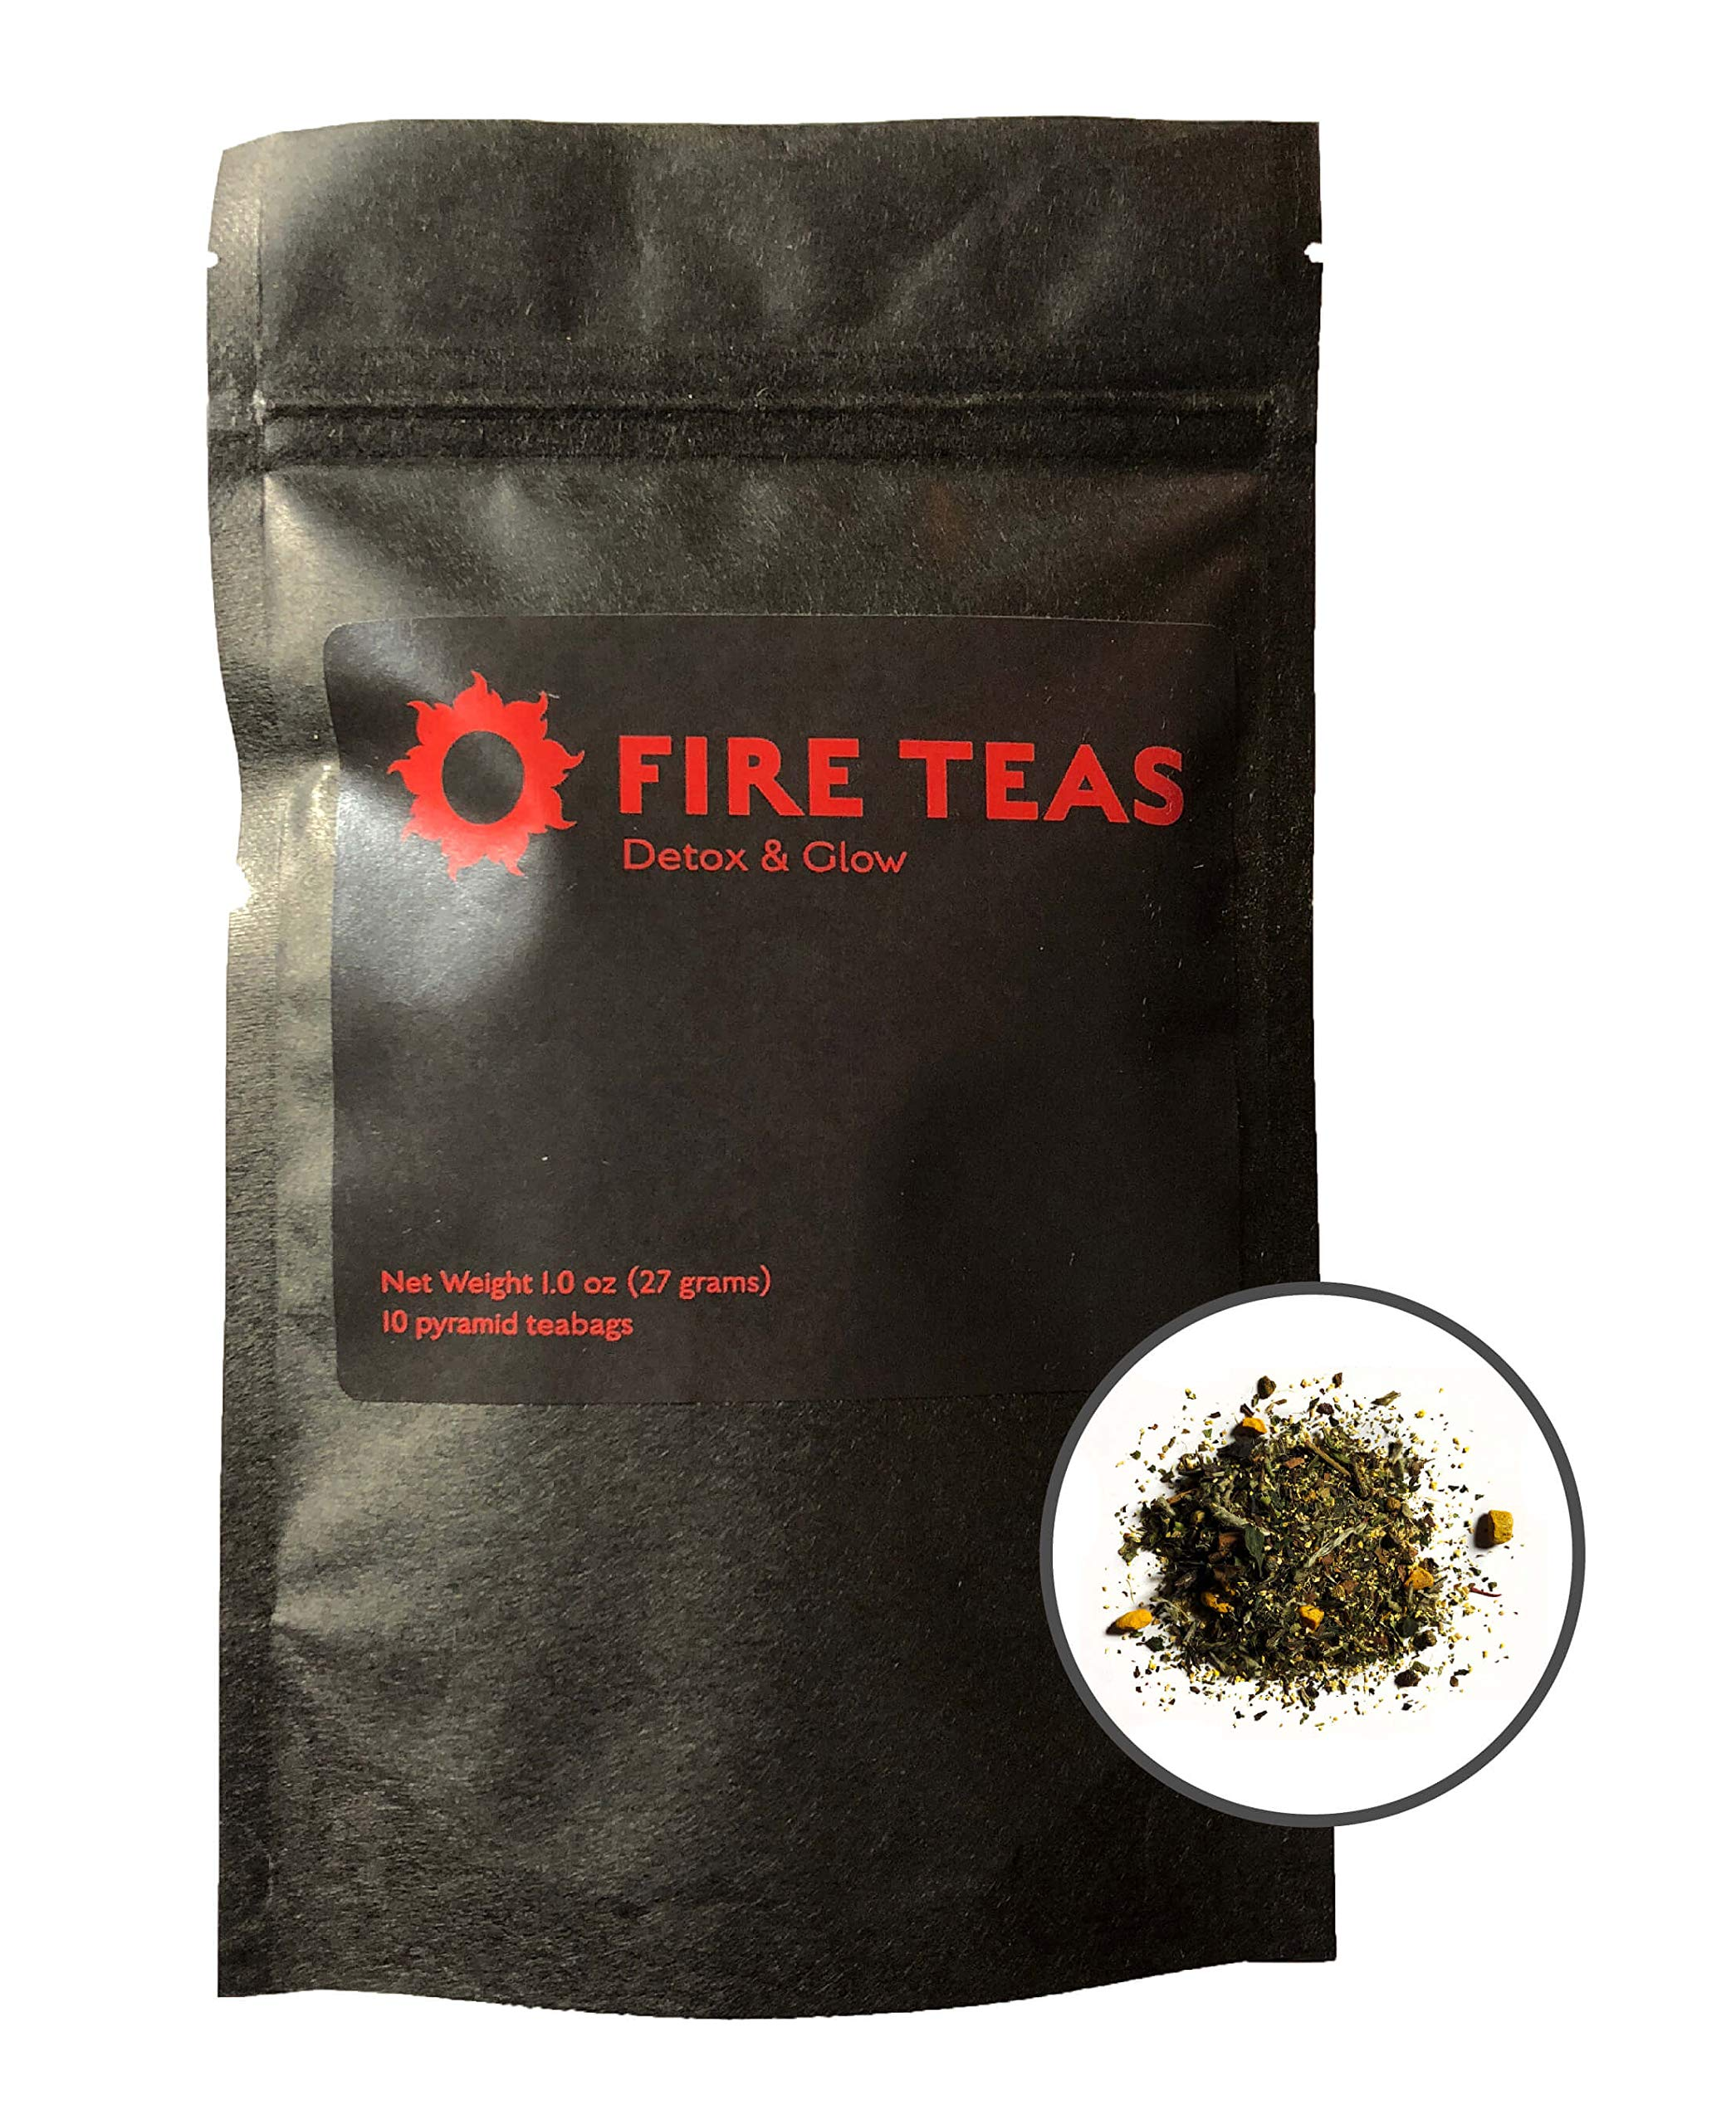 FIRE TEAS - DETOX & GLOW - Weight Loss & Ayurvedic Slim Diet Tea- Organic Turmeric, Ginger, White Tea (Bai Mudan), Cardamom, Cinnamon & Saffron- 10 Times More Anti Oxidants Than Green Tea- Made in WA